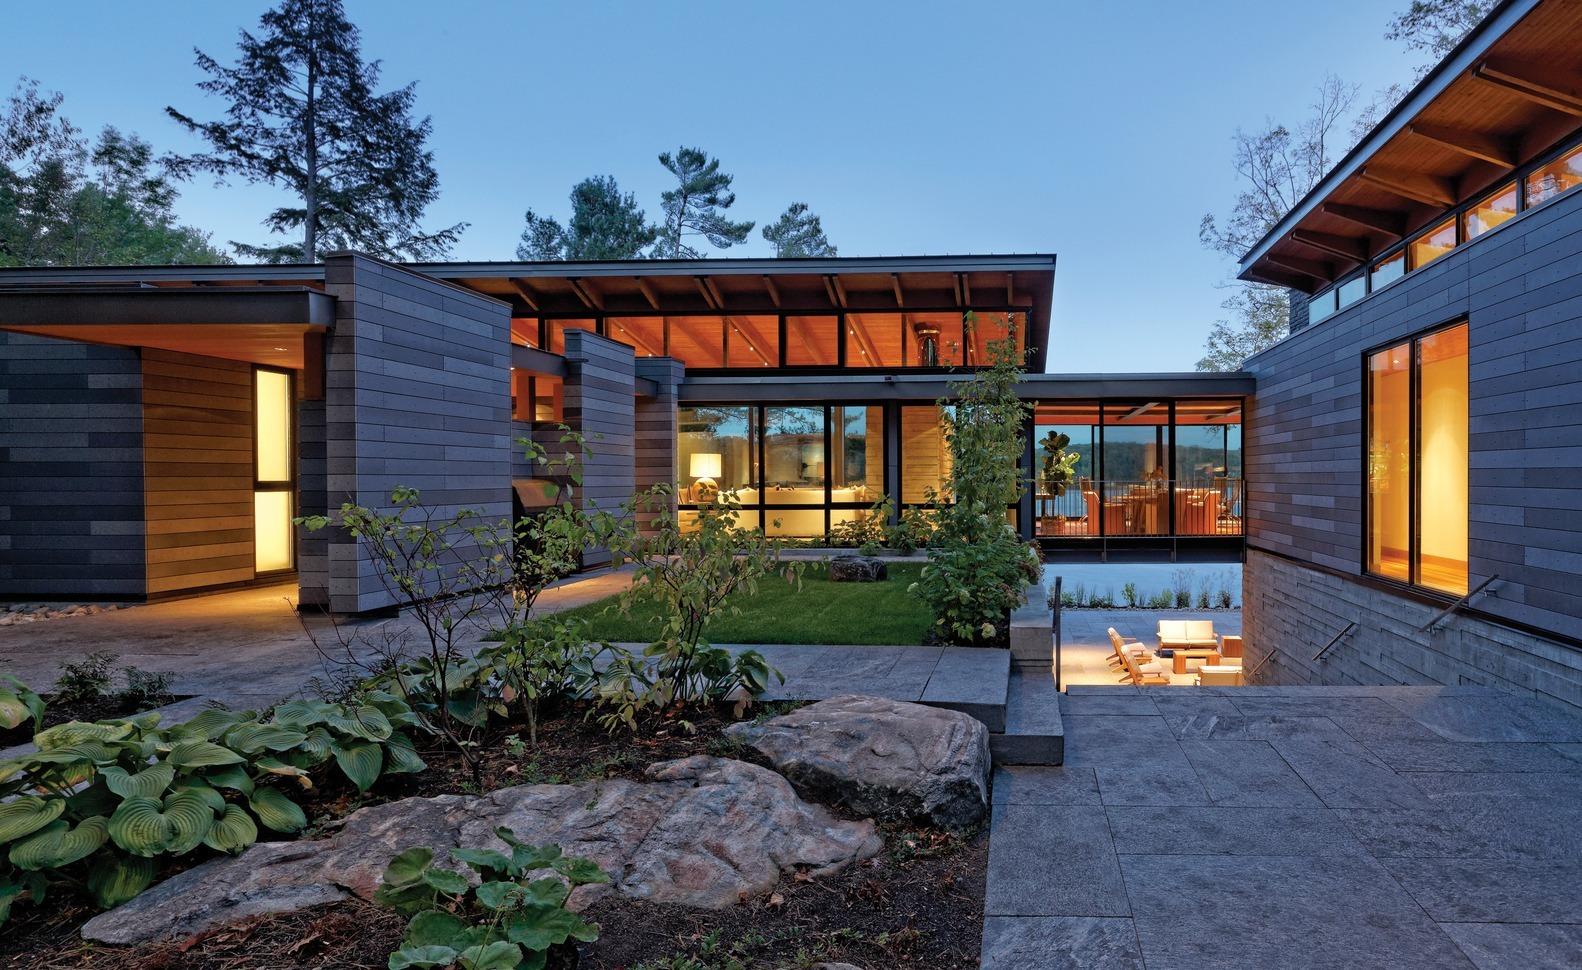 Bridge House / +VG Architects - architecture - red_wolf | ello